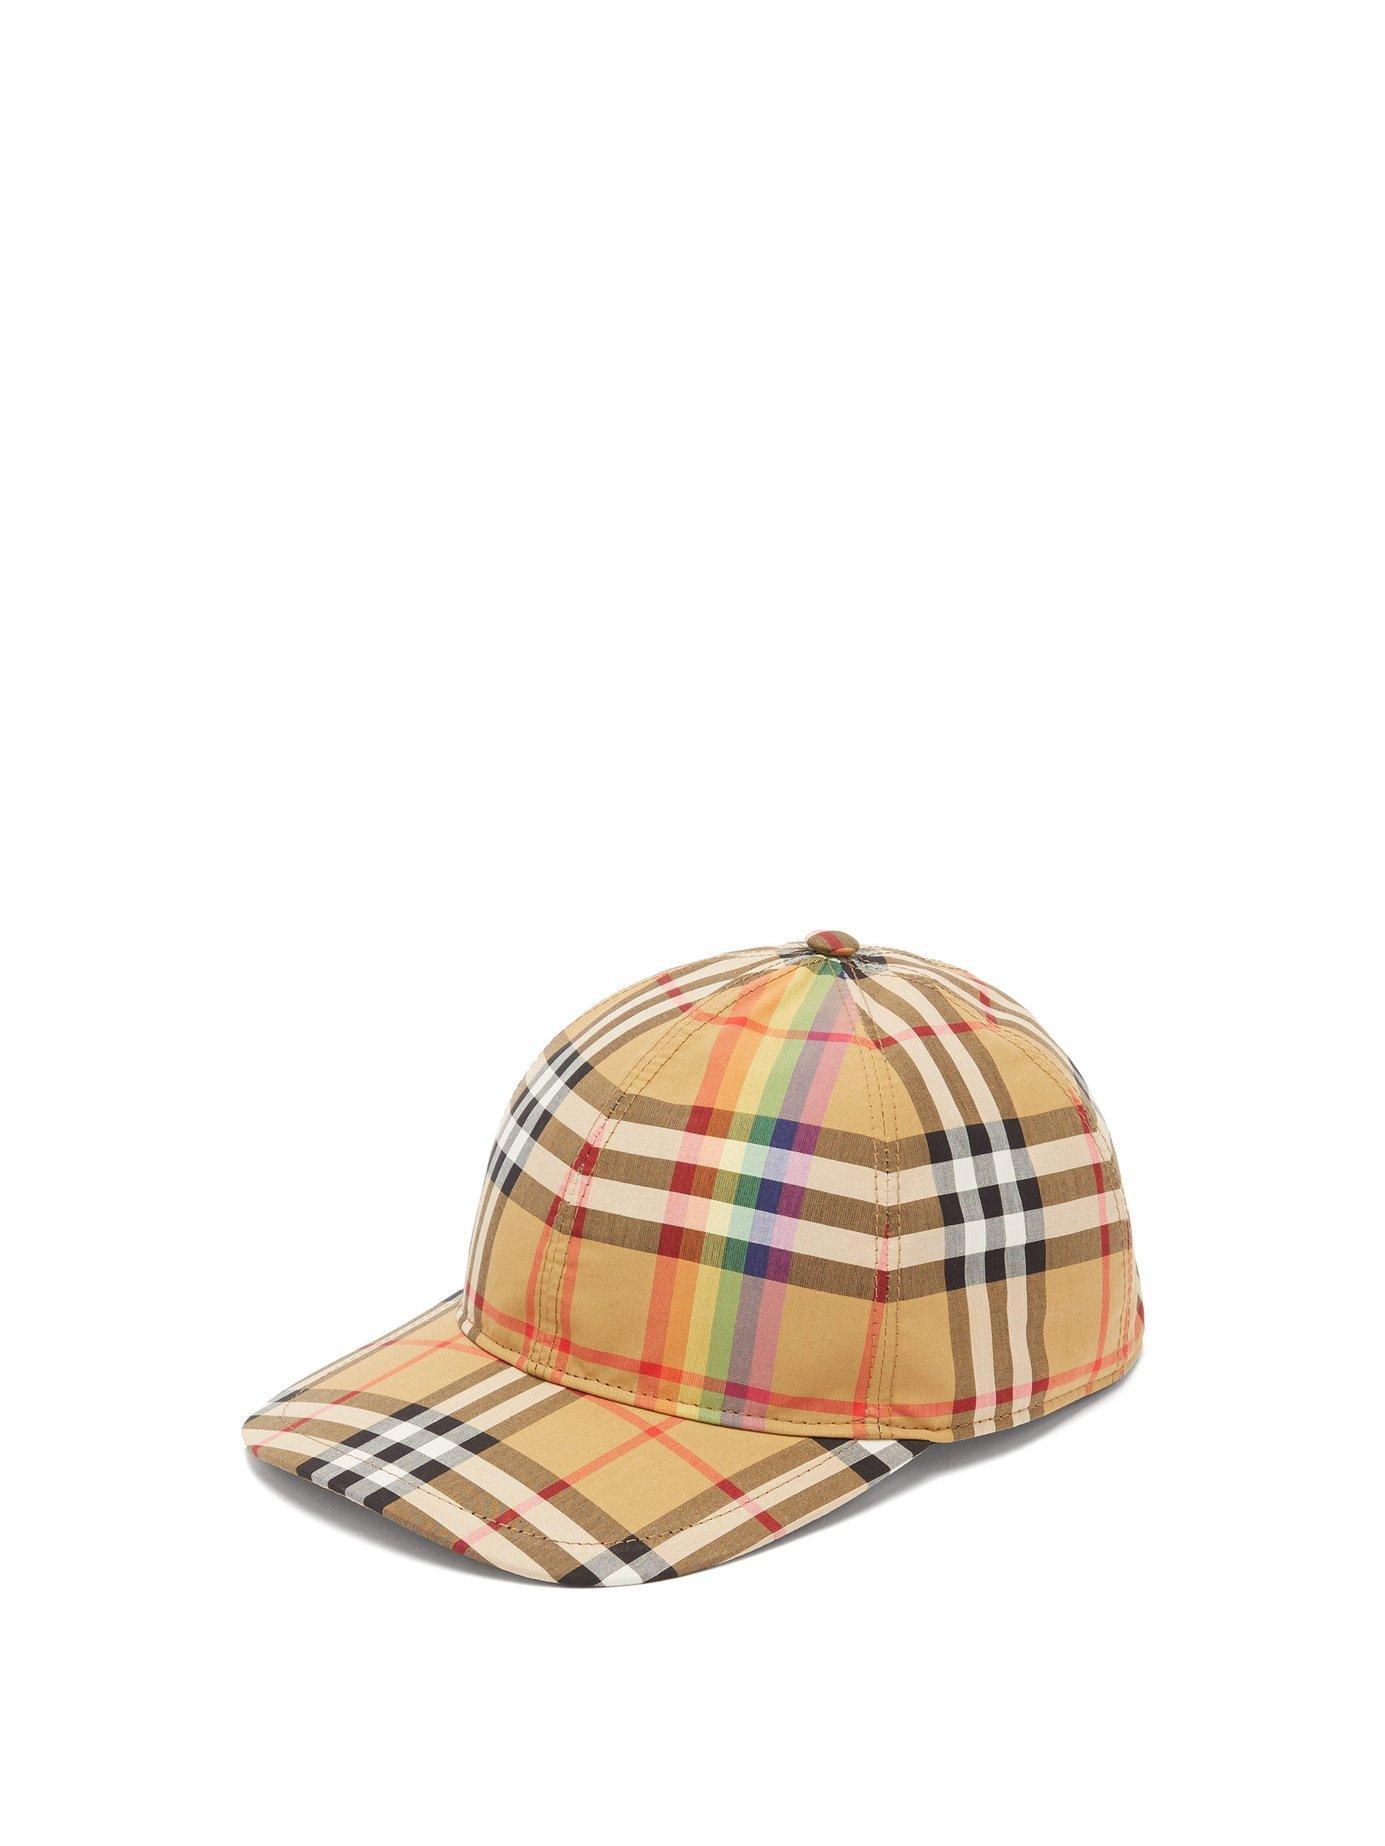 193716ba8d555 Burberry Rainbow Stripe Vintage Check Baseball Cap In Brown